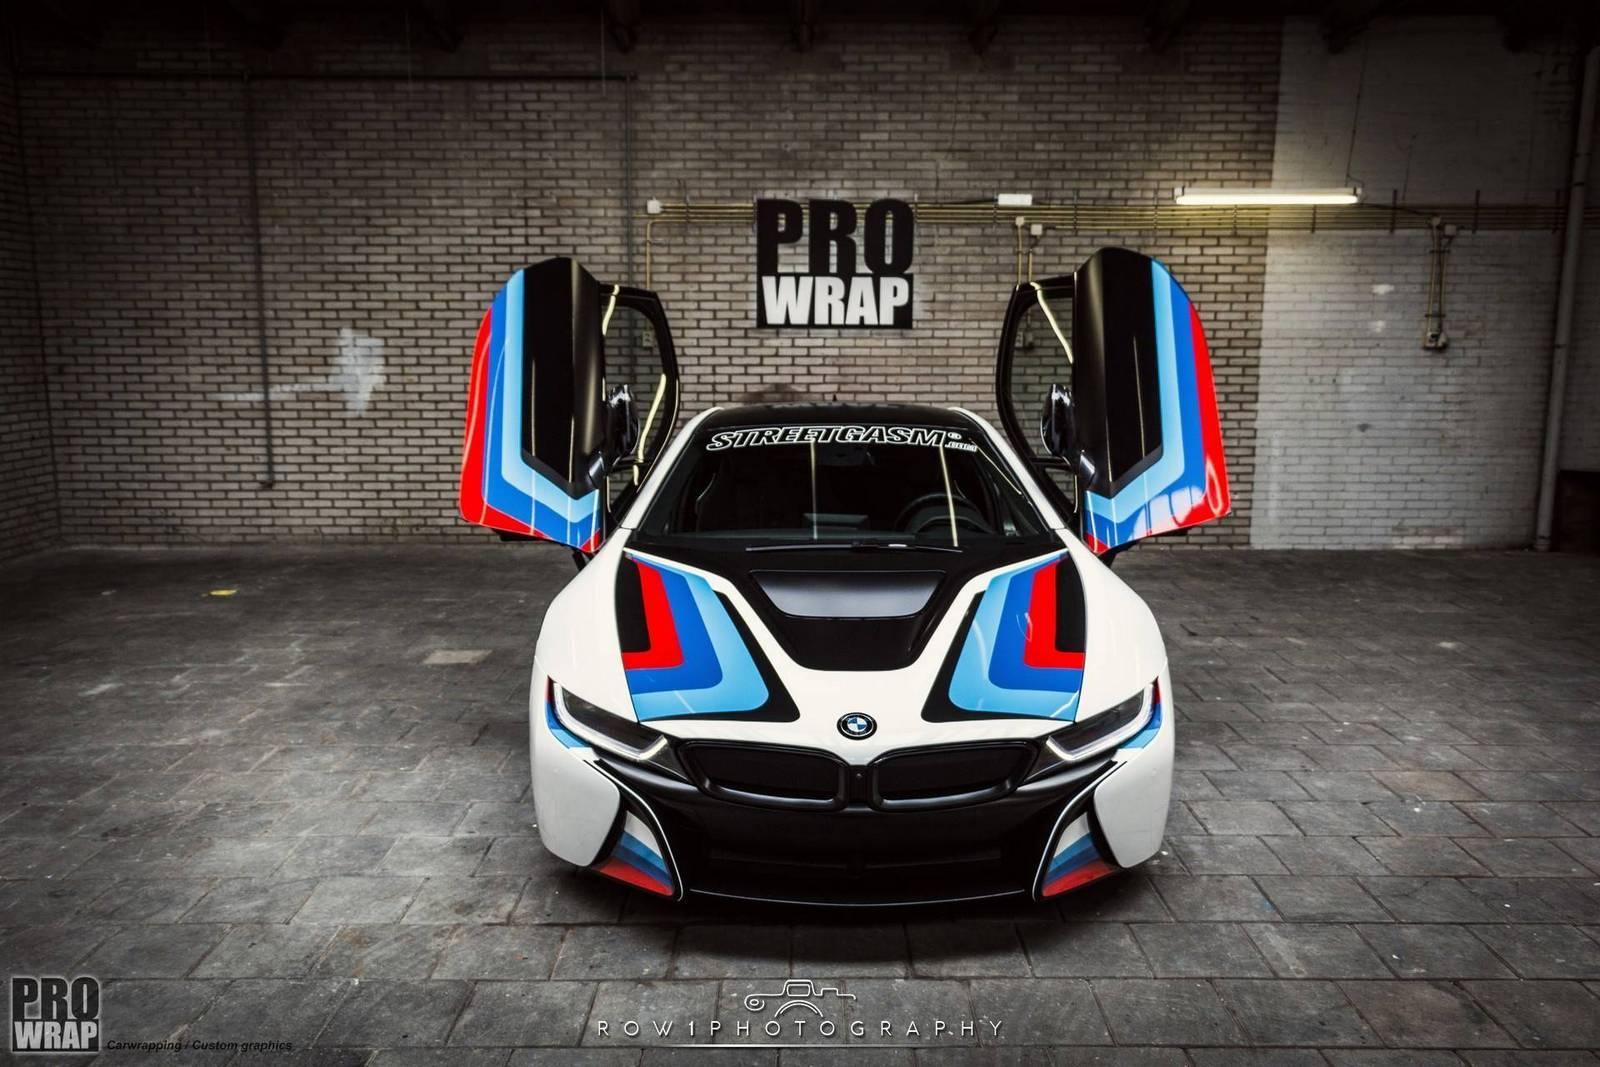 Custom Wrapped BMW i8 by Prowrap in The Netherlands - GTspirit on custom bmw m4 coupe, custom ferrari 458 italia, custom alfa romeo 4c, custom bmw m8, custom bmw x4, custom bmw z8, custom bmw i3, custom bmw i6, custom aston martin v12 vantage, custom bmw z4, custom bmw 8 series, custom bmw m1, custom porsche macan, custom bmw z3, custom bmw x5, custom bmw m3, custom bmw x1, custom bmw m6, custom bmw 4 series, custom bmw 3 series,